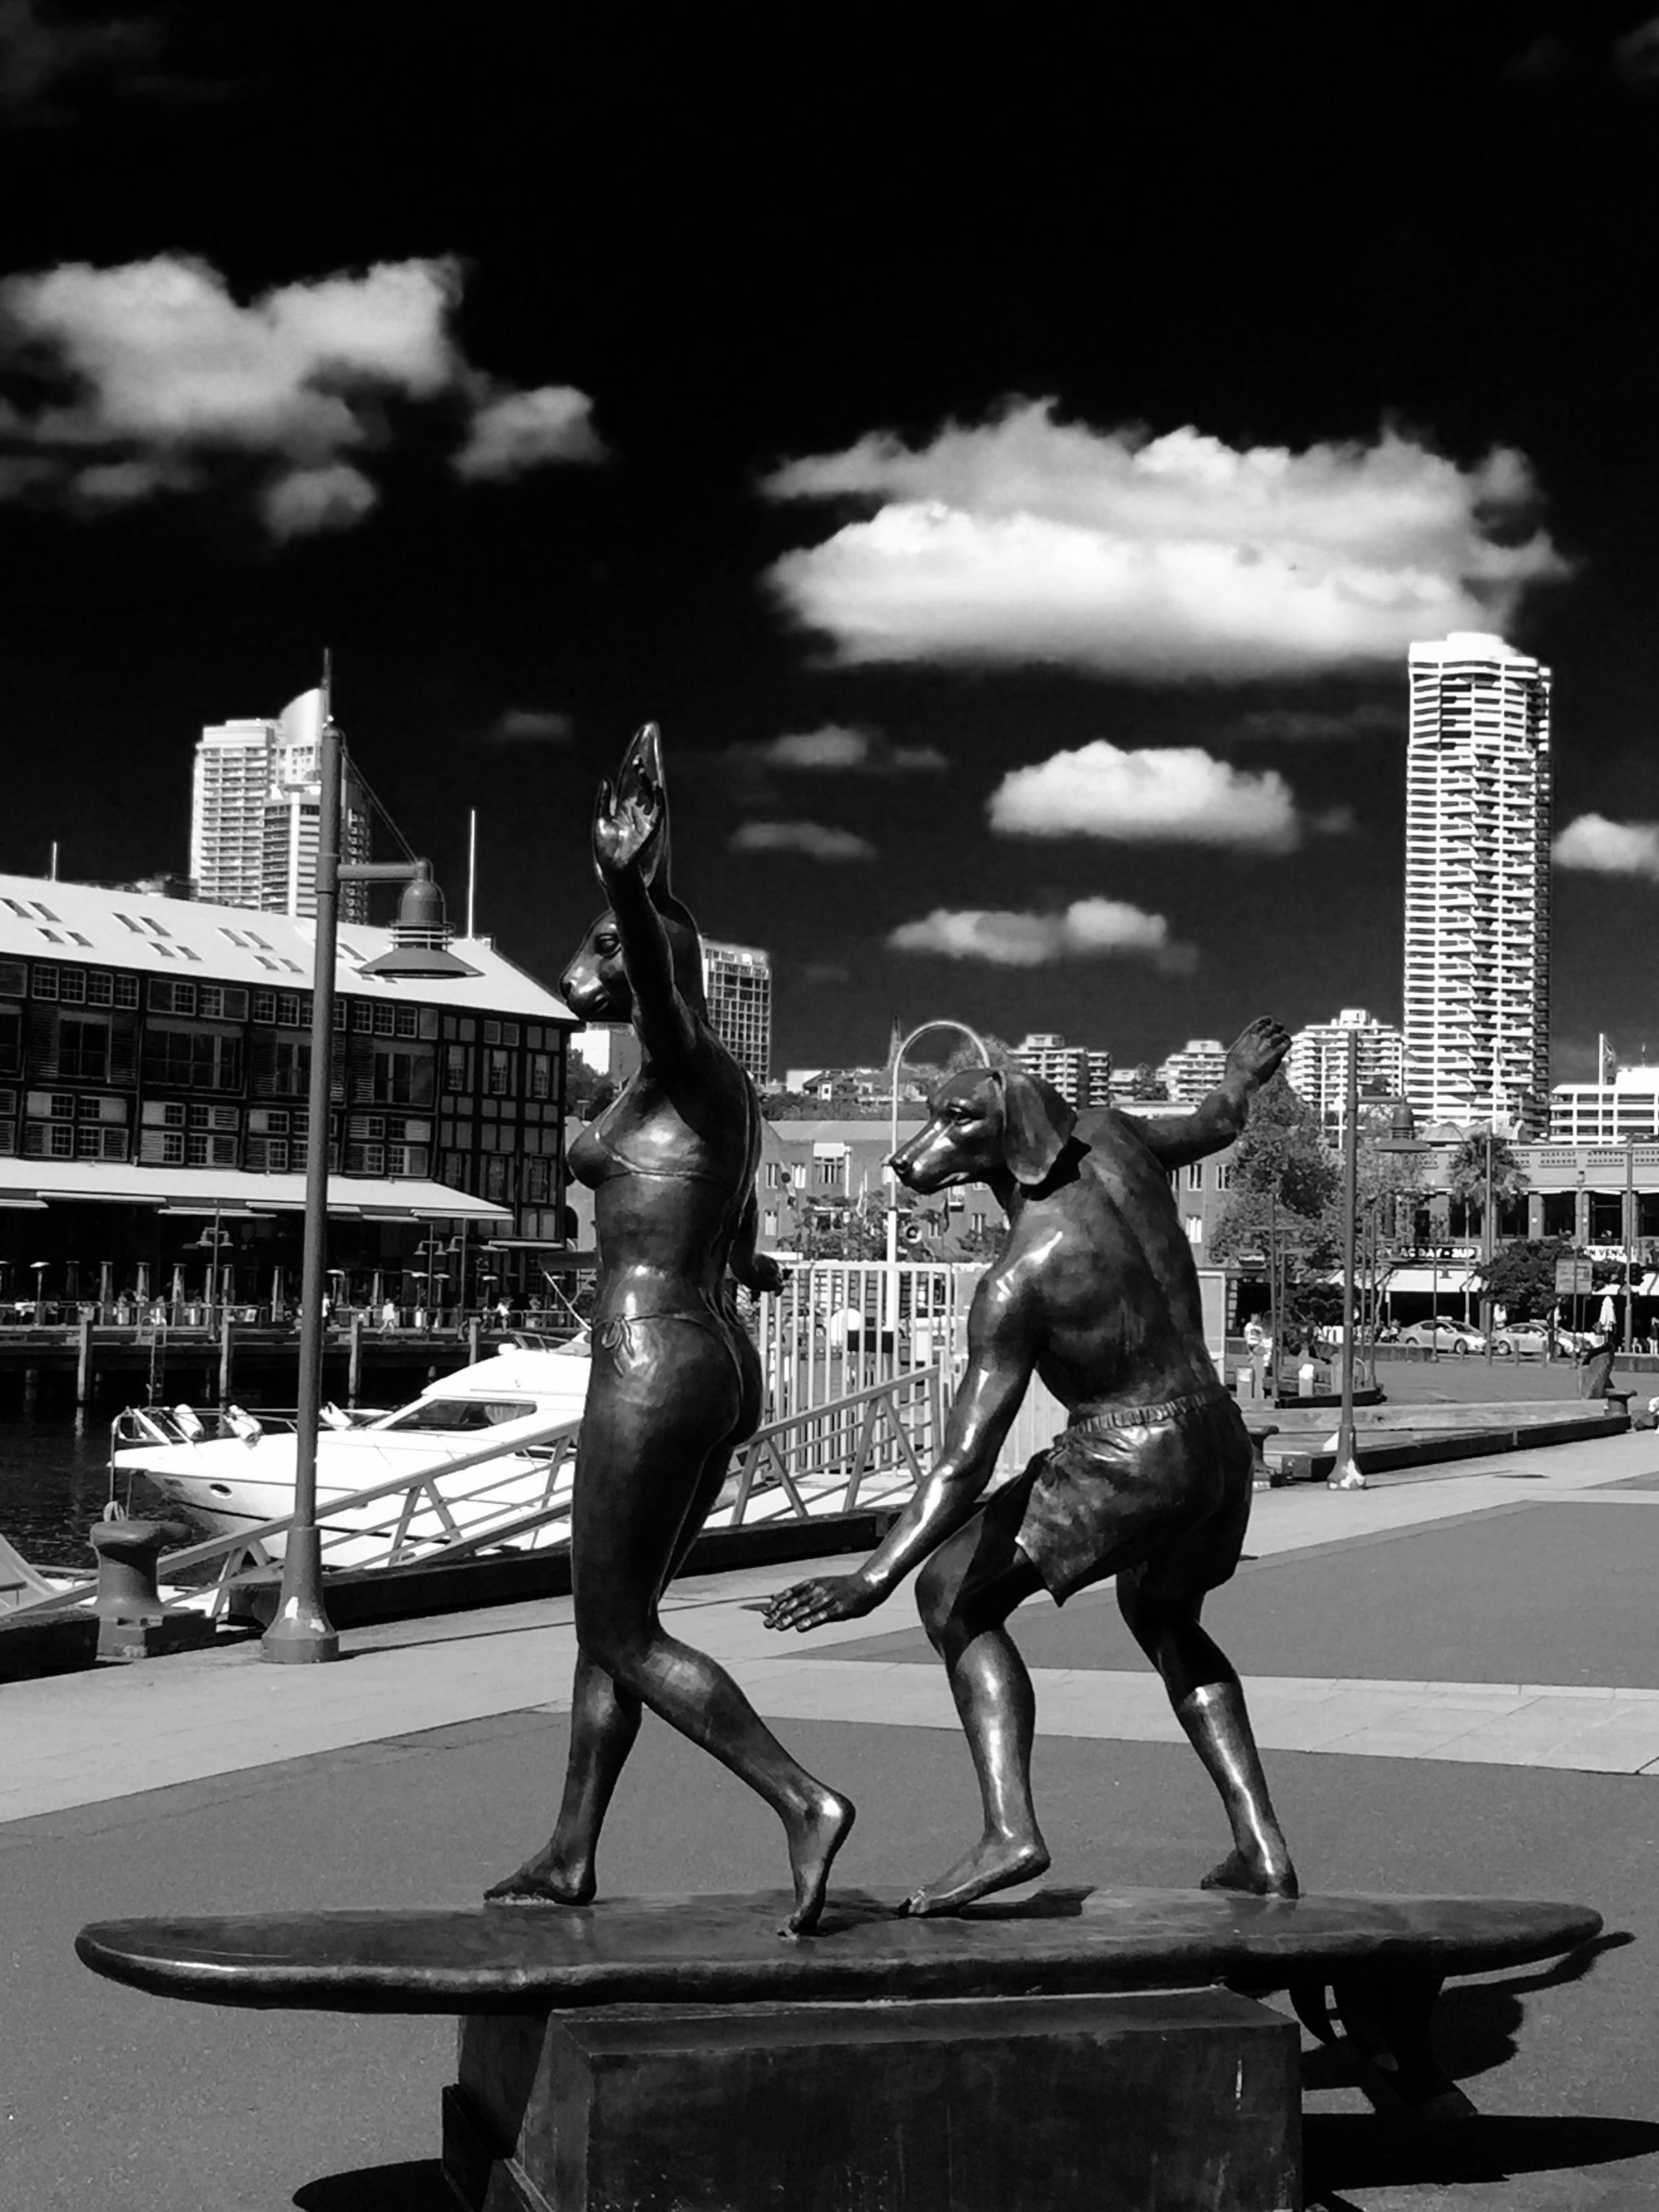 Sydney City Surfing